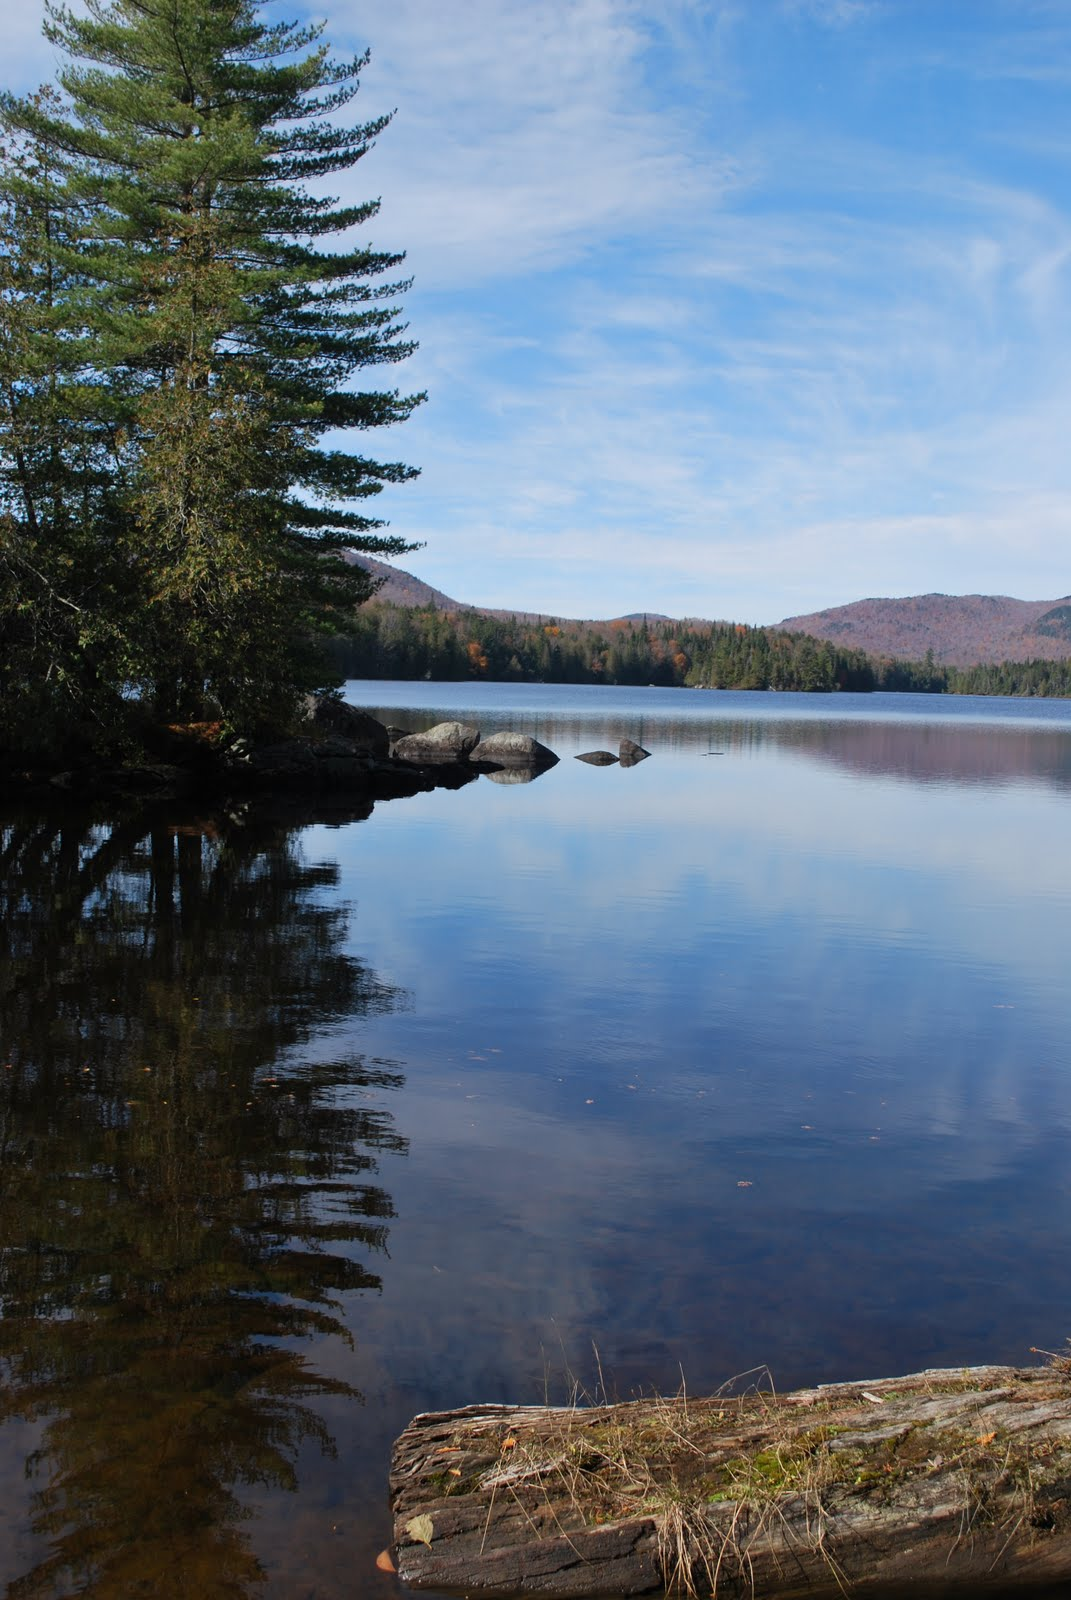 The Adirondack Whitefish - - The Adirondack Almanack